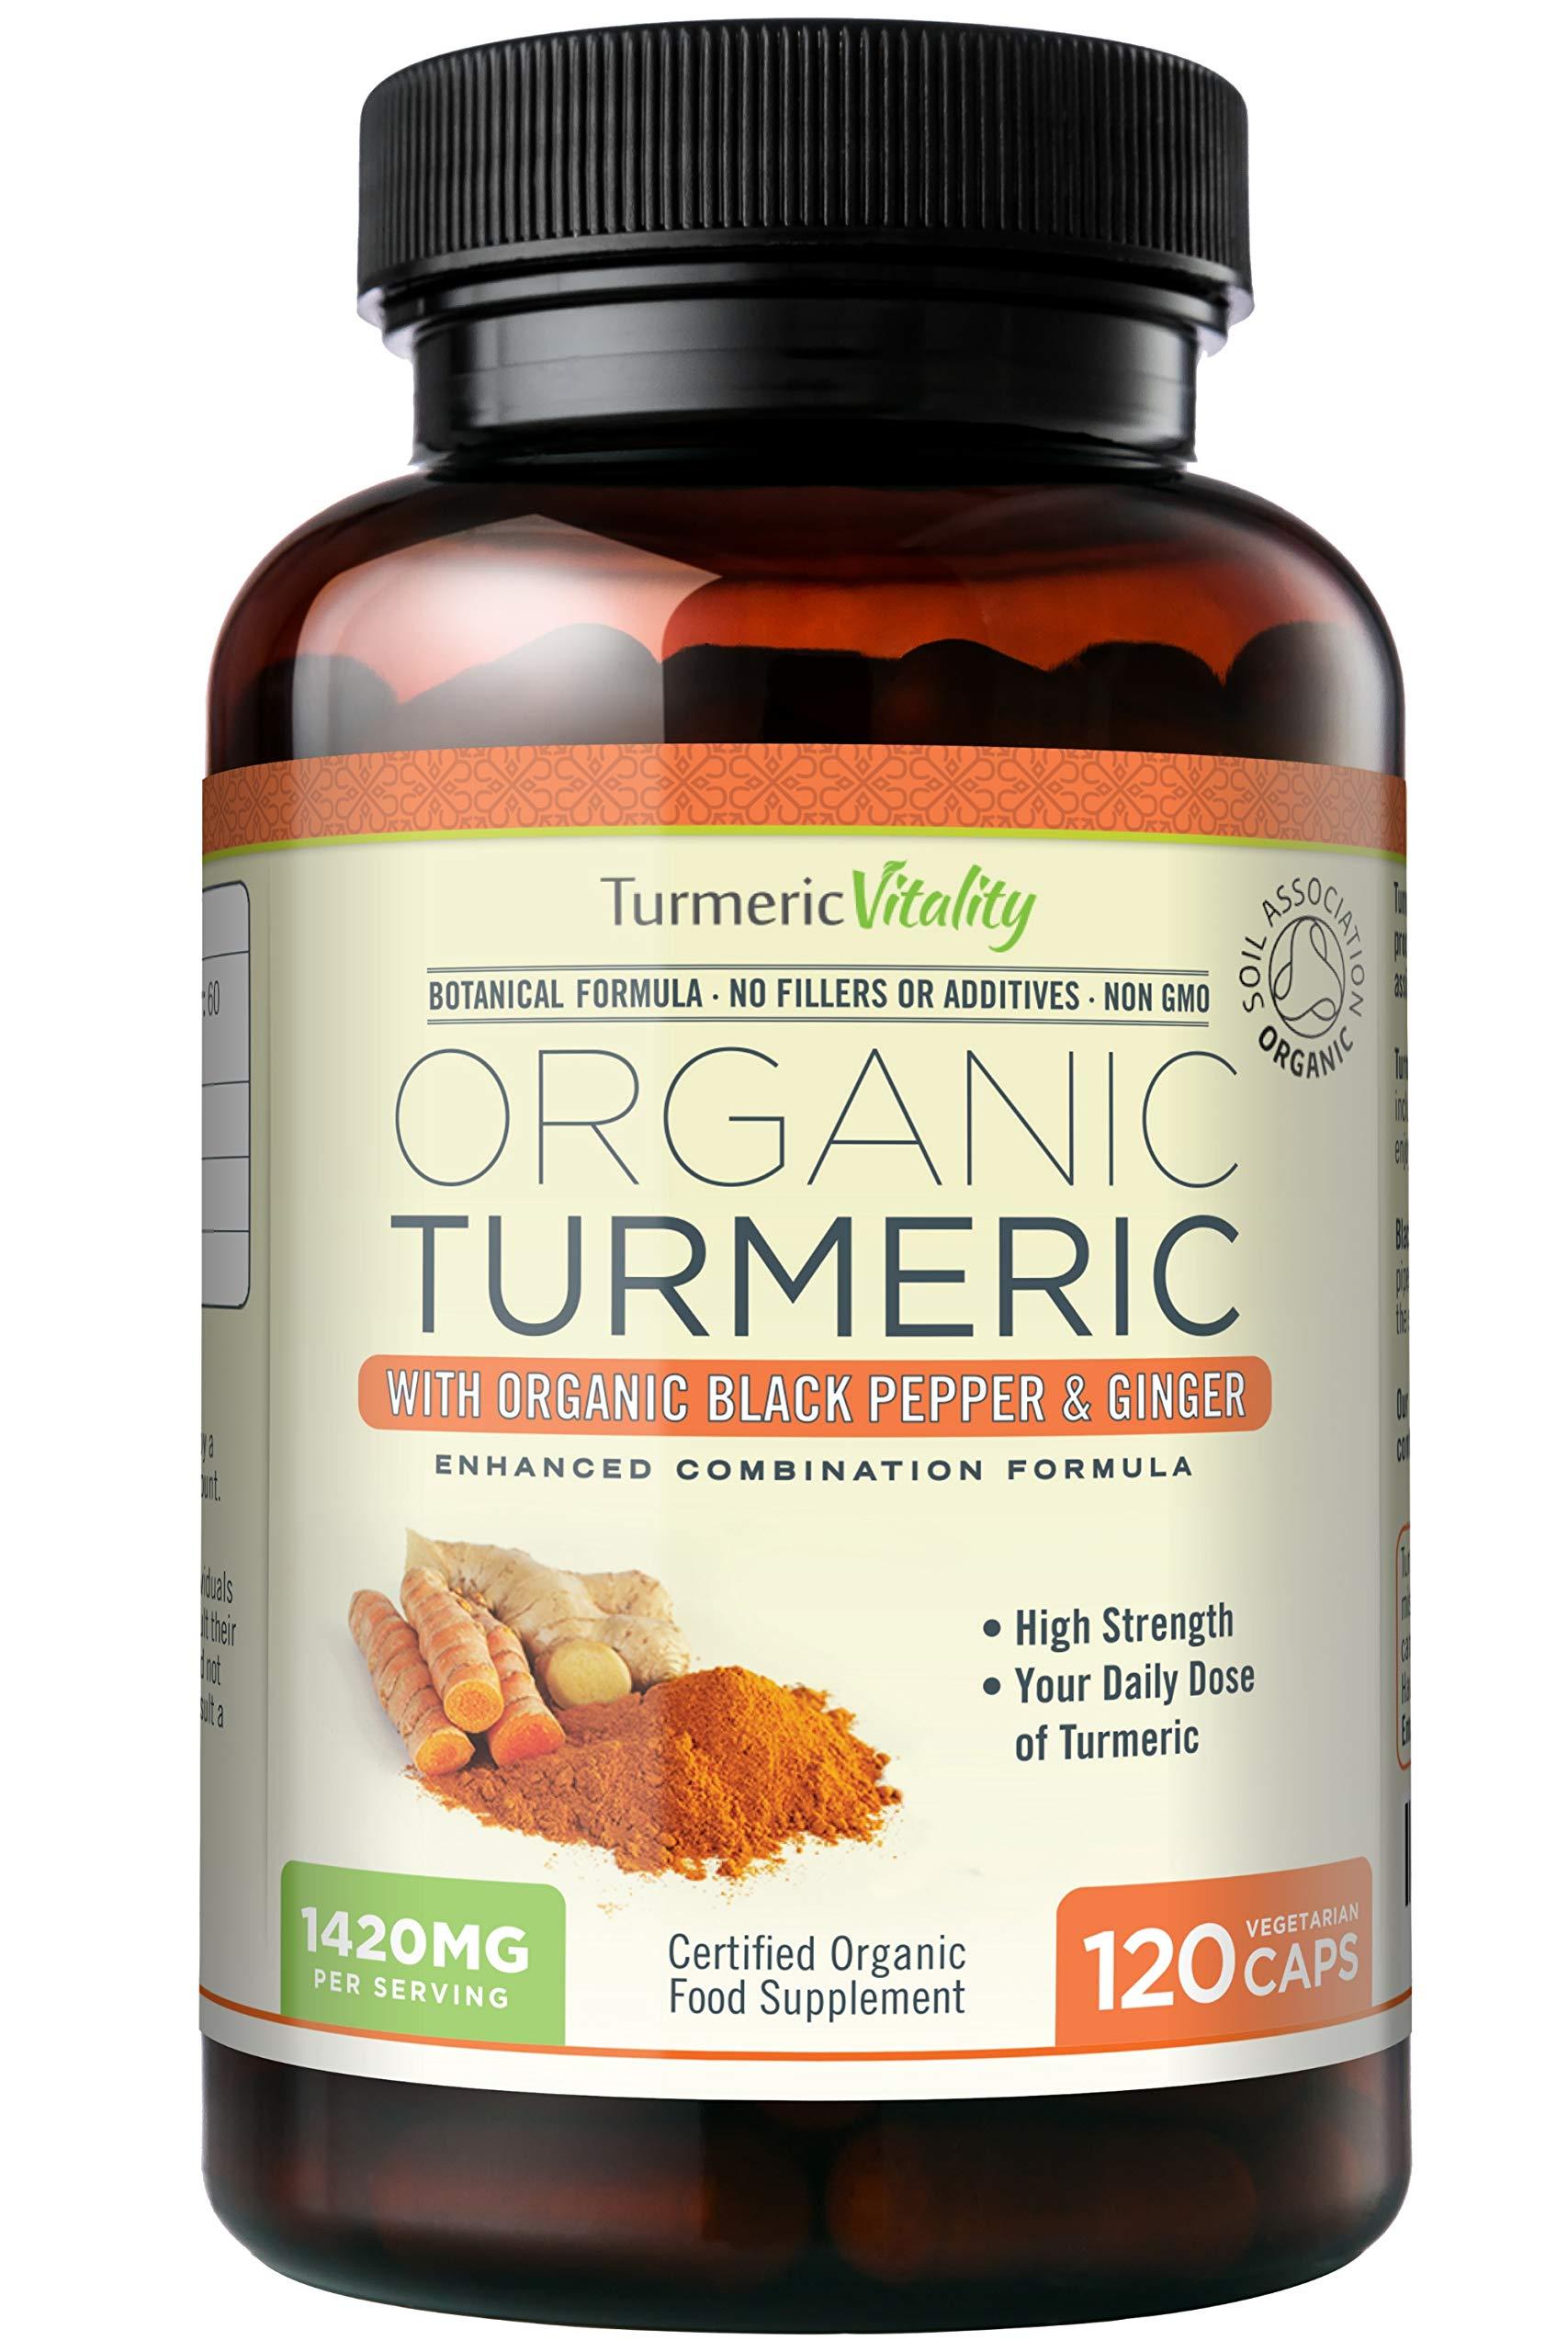 Turmeric Vitality Organic Turmeric Curcumin Capsules 1420mg High Strength Serving with Black Pepper & Ginger for Maximum Absorption of Curcumin | 120 Veg Capsules - Certified Organic Supplement